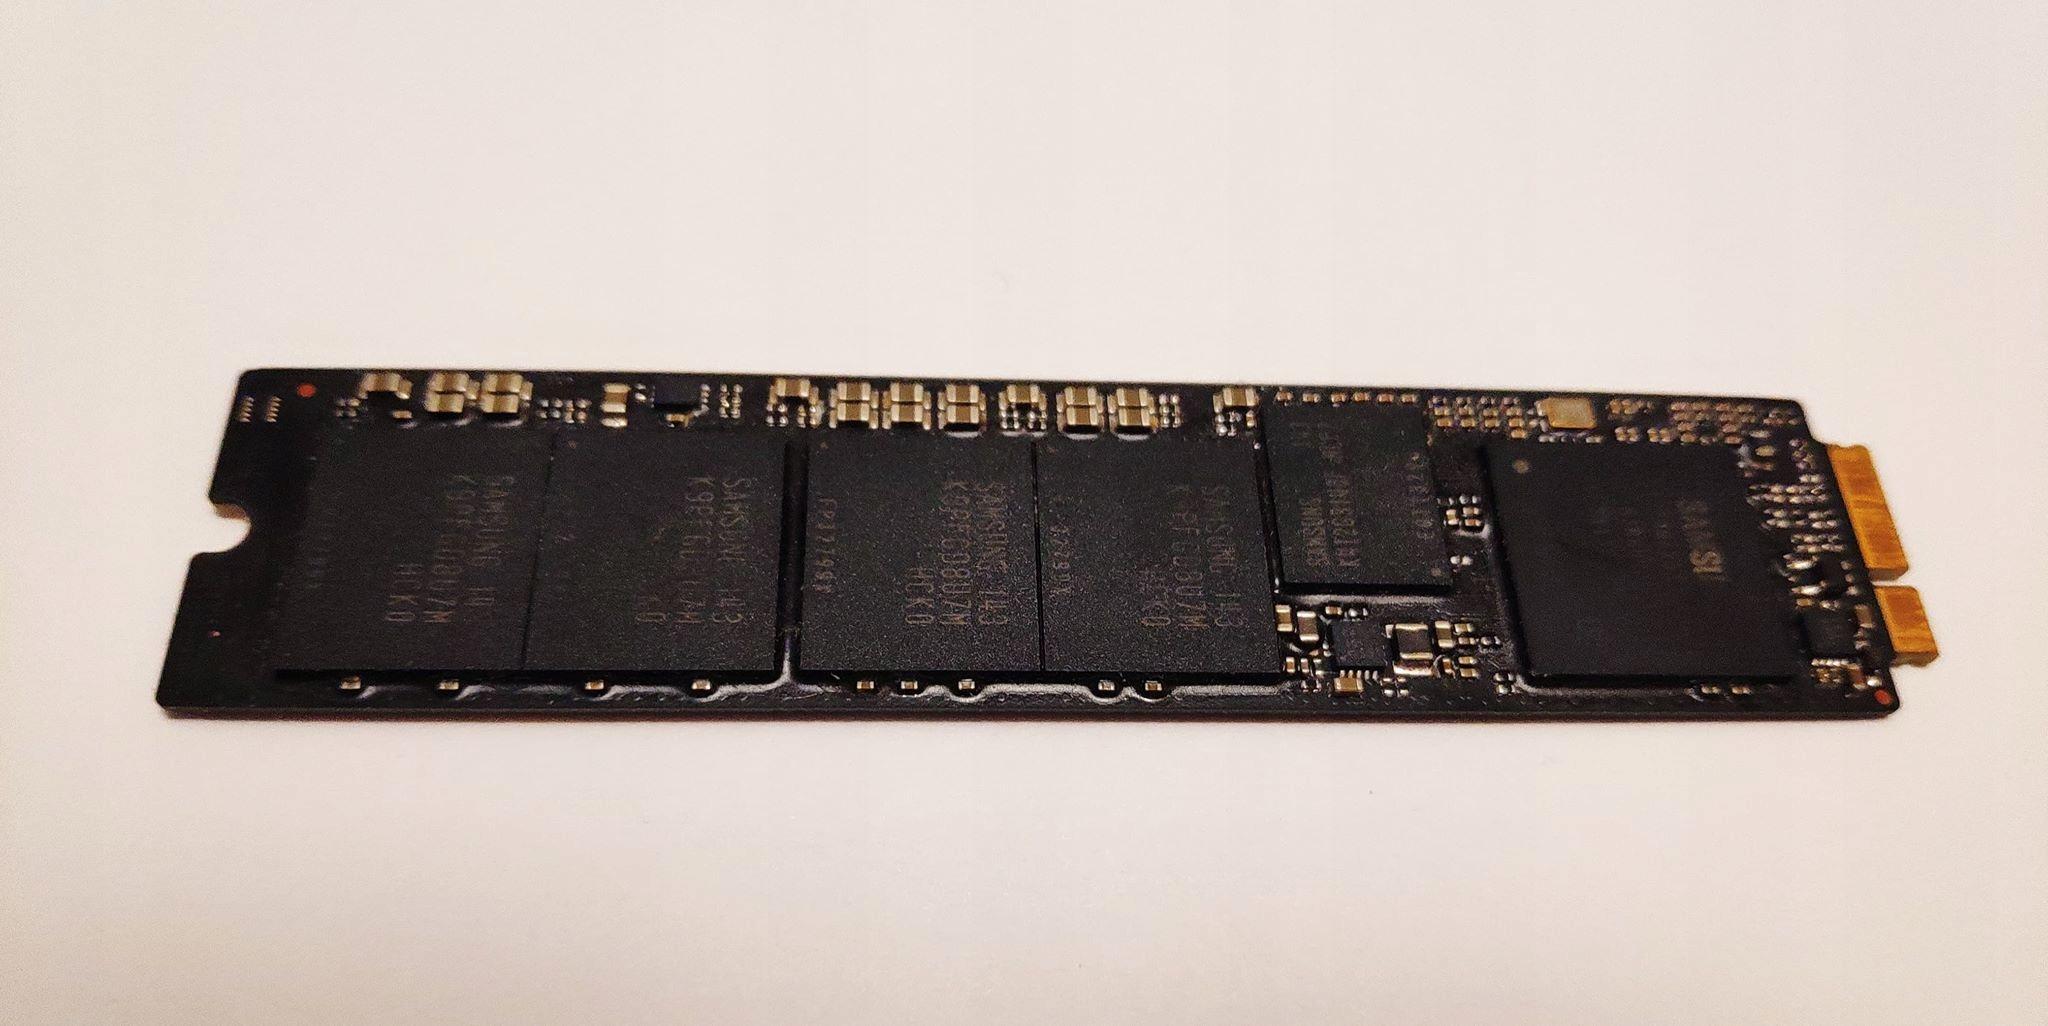 Dysk 128GB SSD dla Apple MacBook SAMSUNG 2011 rok